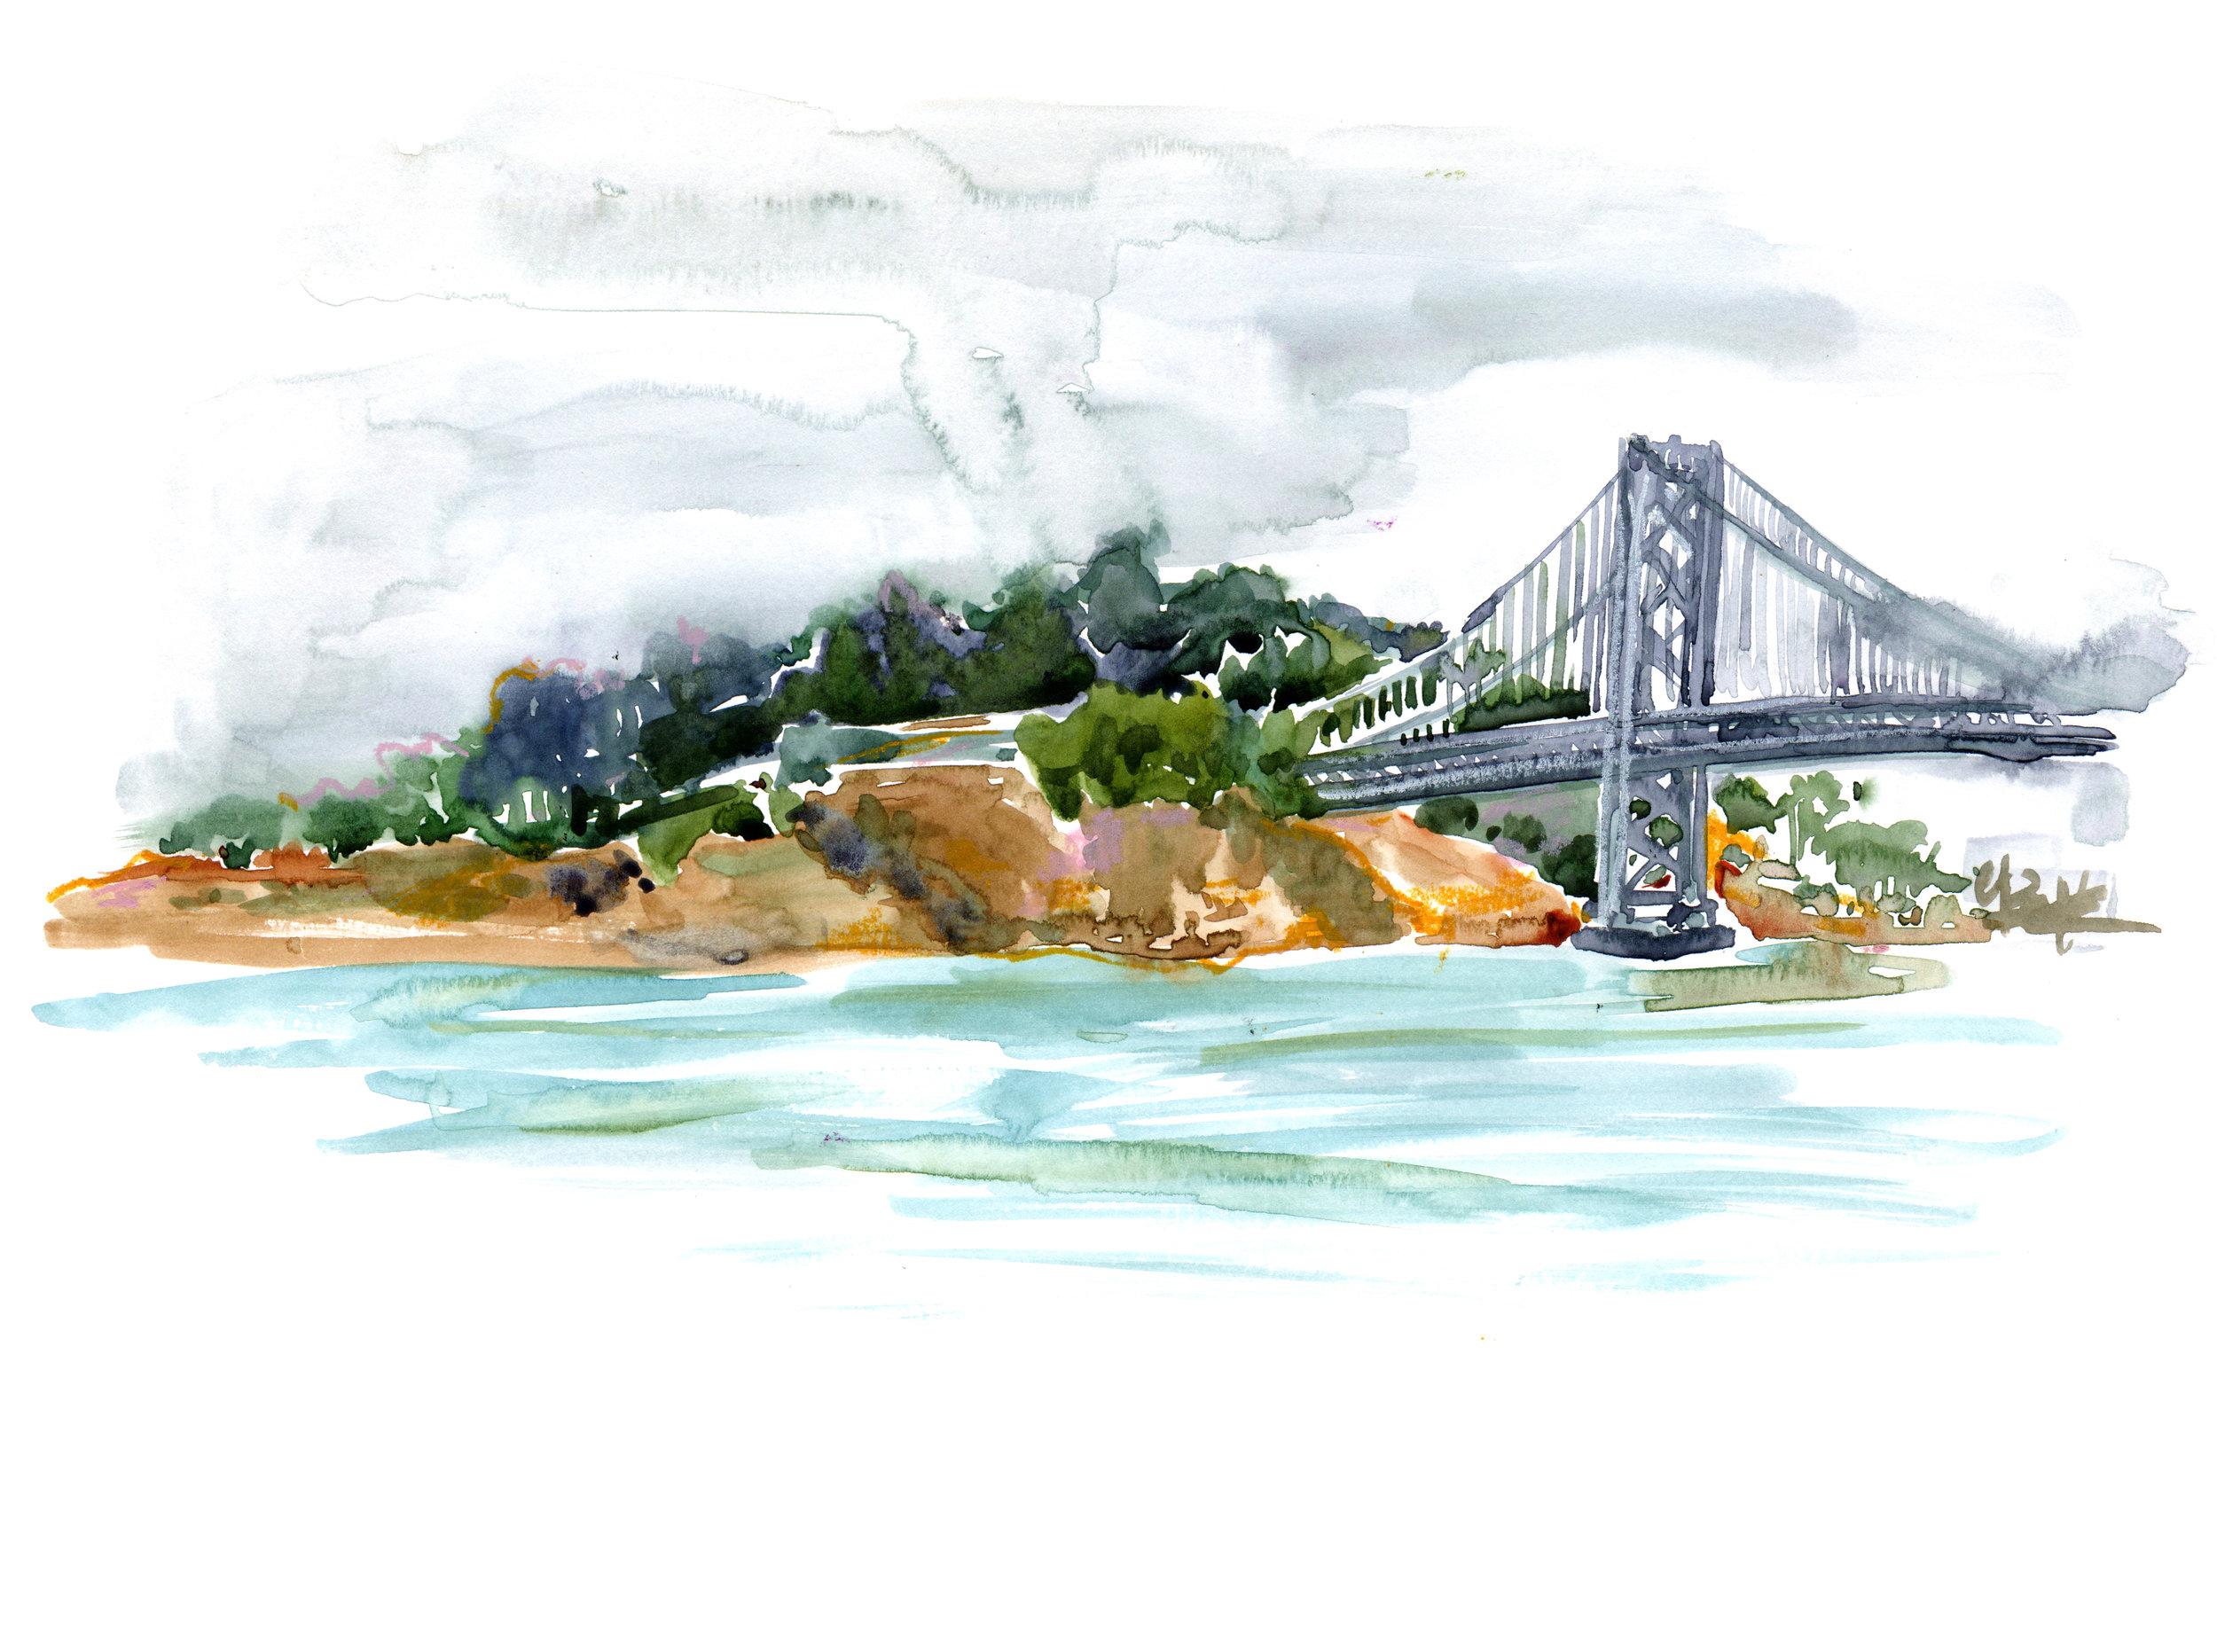 BAY BRIDGE / SAN FRANCISCO, CA